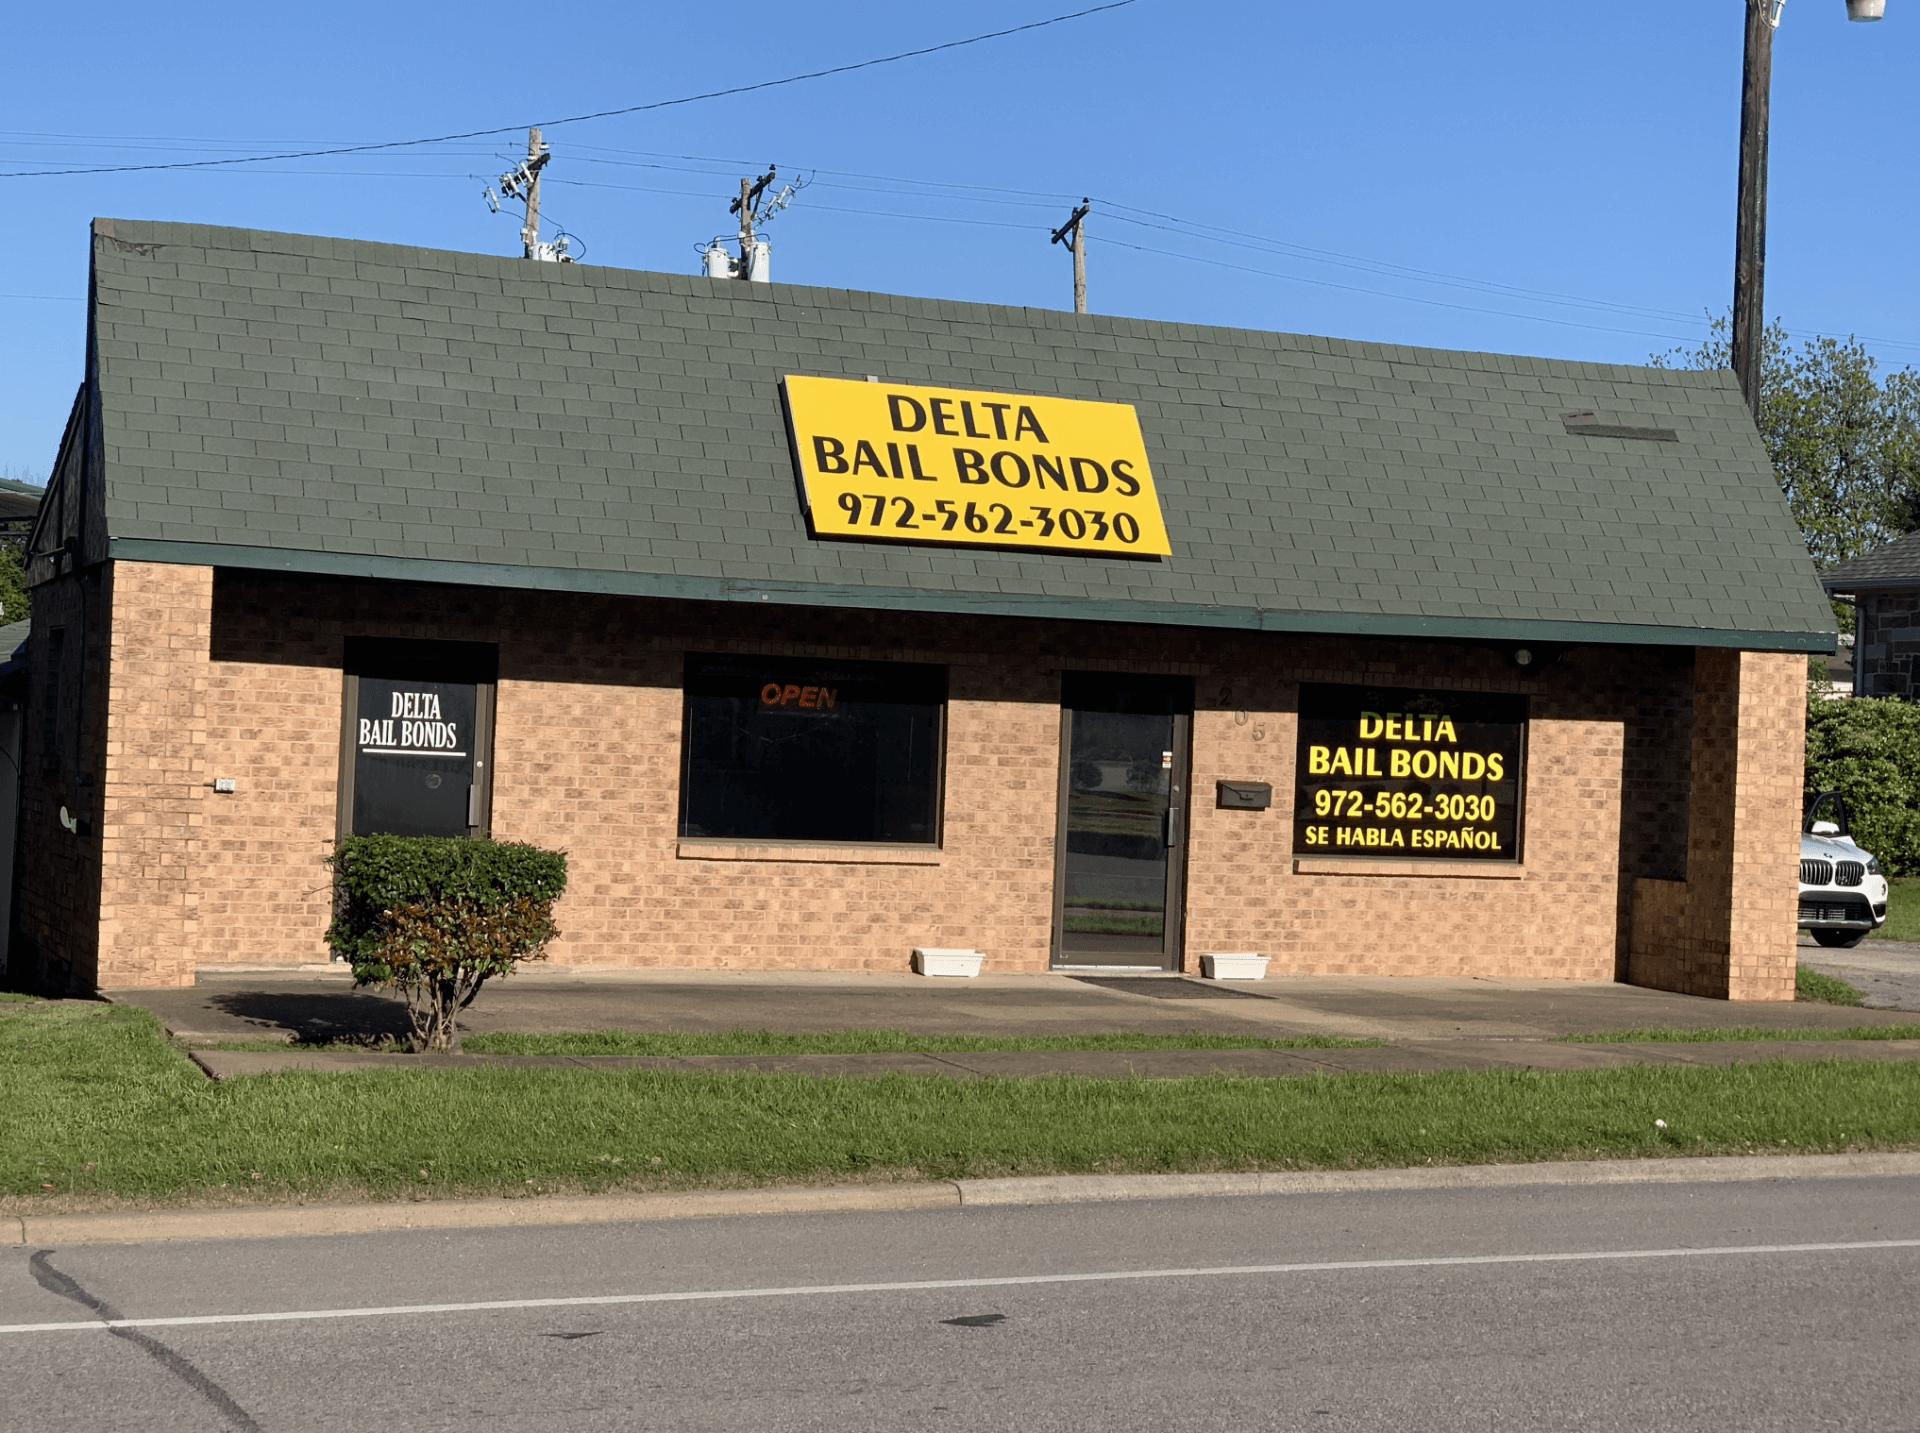 Delta Bail Bonds office in McKinney, TX